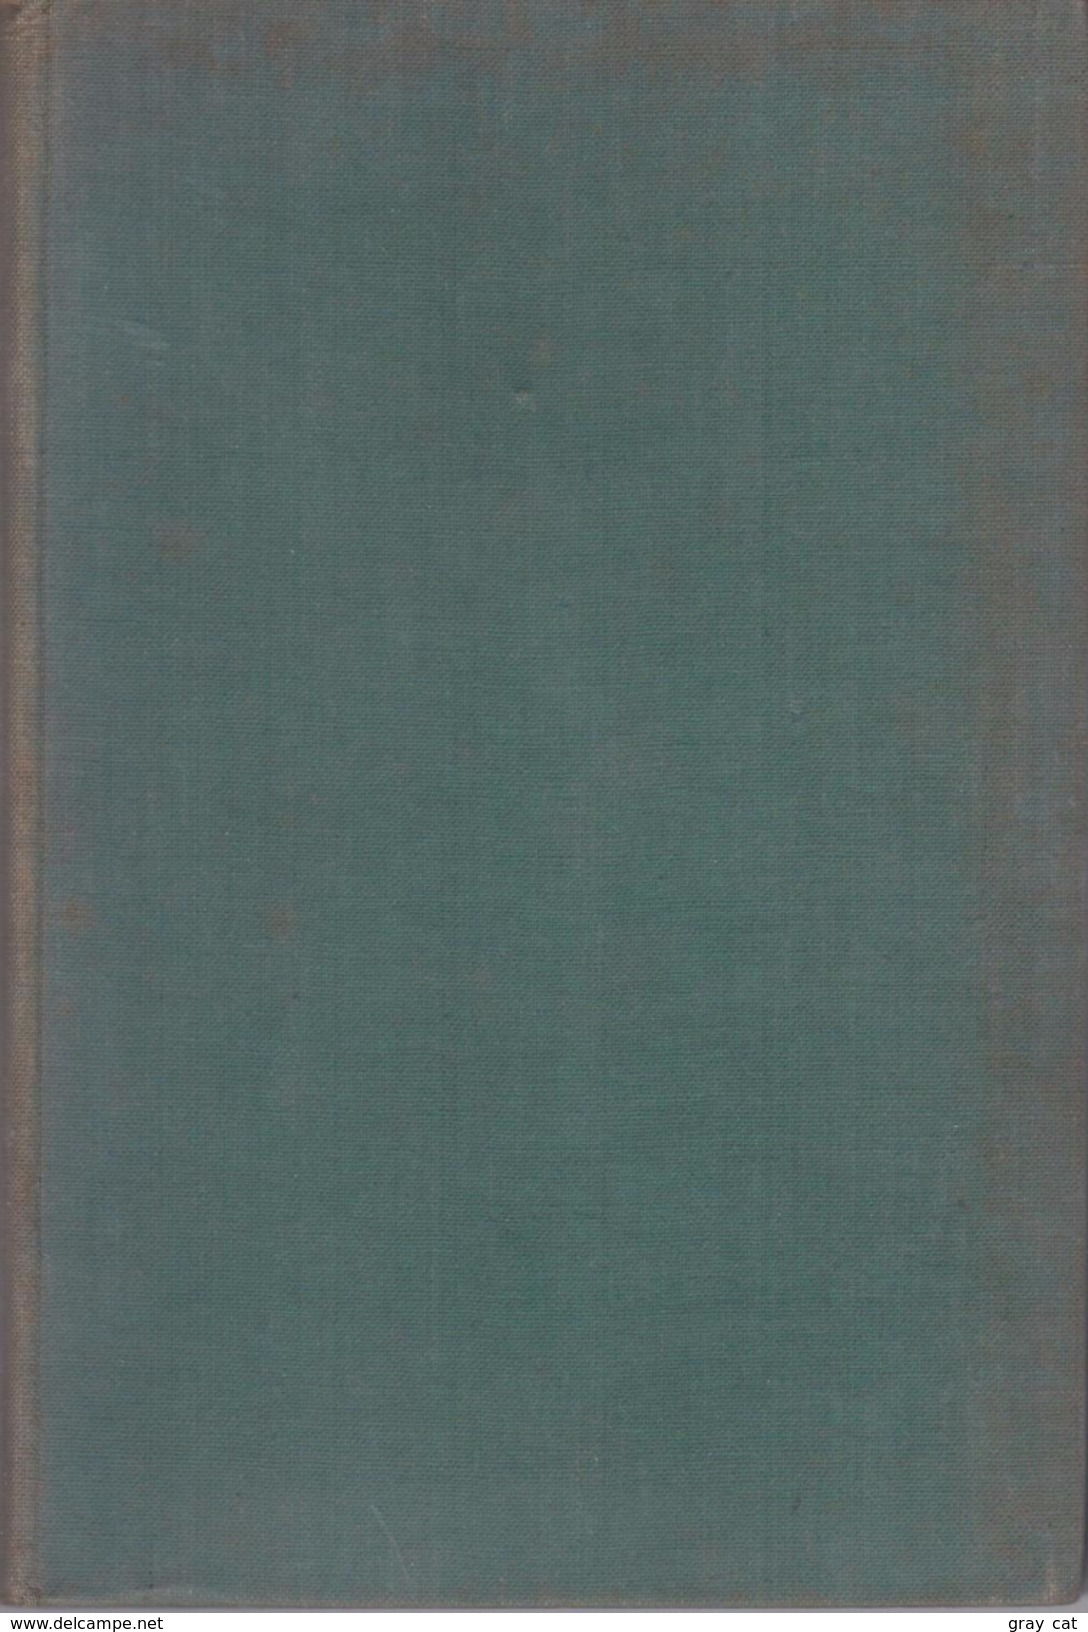 The Rape Of The Locks: The Perikeiromenê Of Menander By Murray, Gilbert - 1900-1949